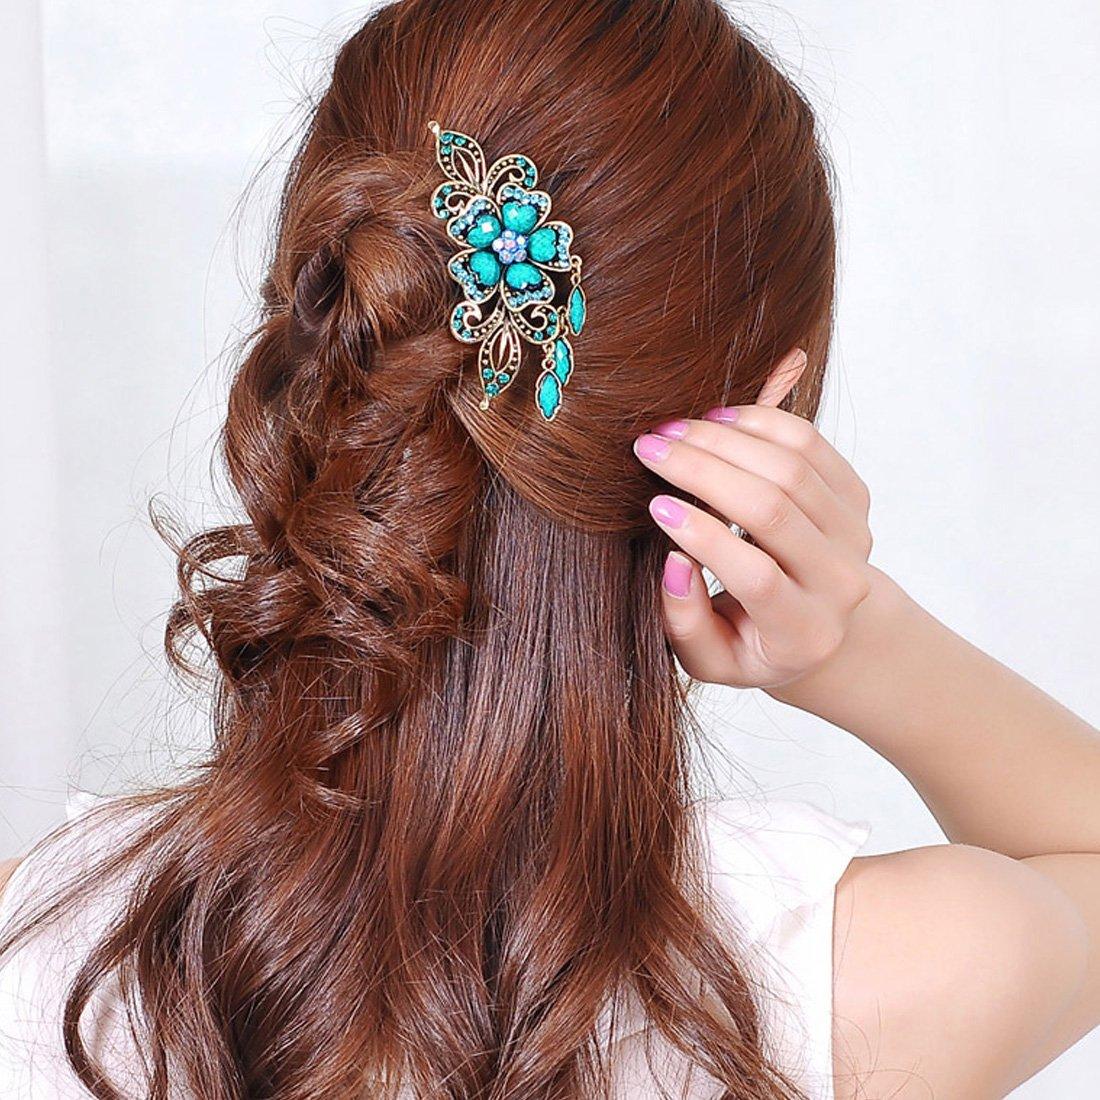 Voberry® Retro Vintage Fashion Antique Bronze Women's Colorfull Rhinestone Elegant Peacock Tuck Comb Hair Clip-colorful with Accessory1 Pcs Random Color 2